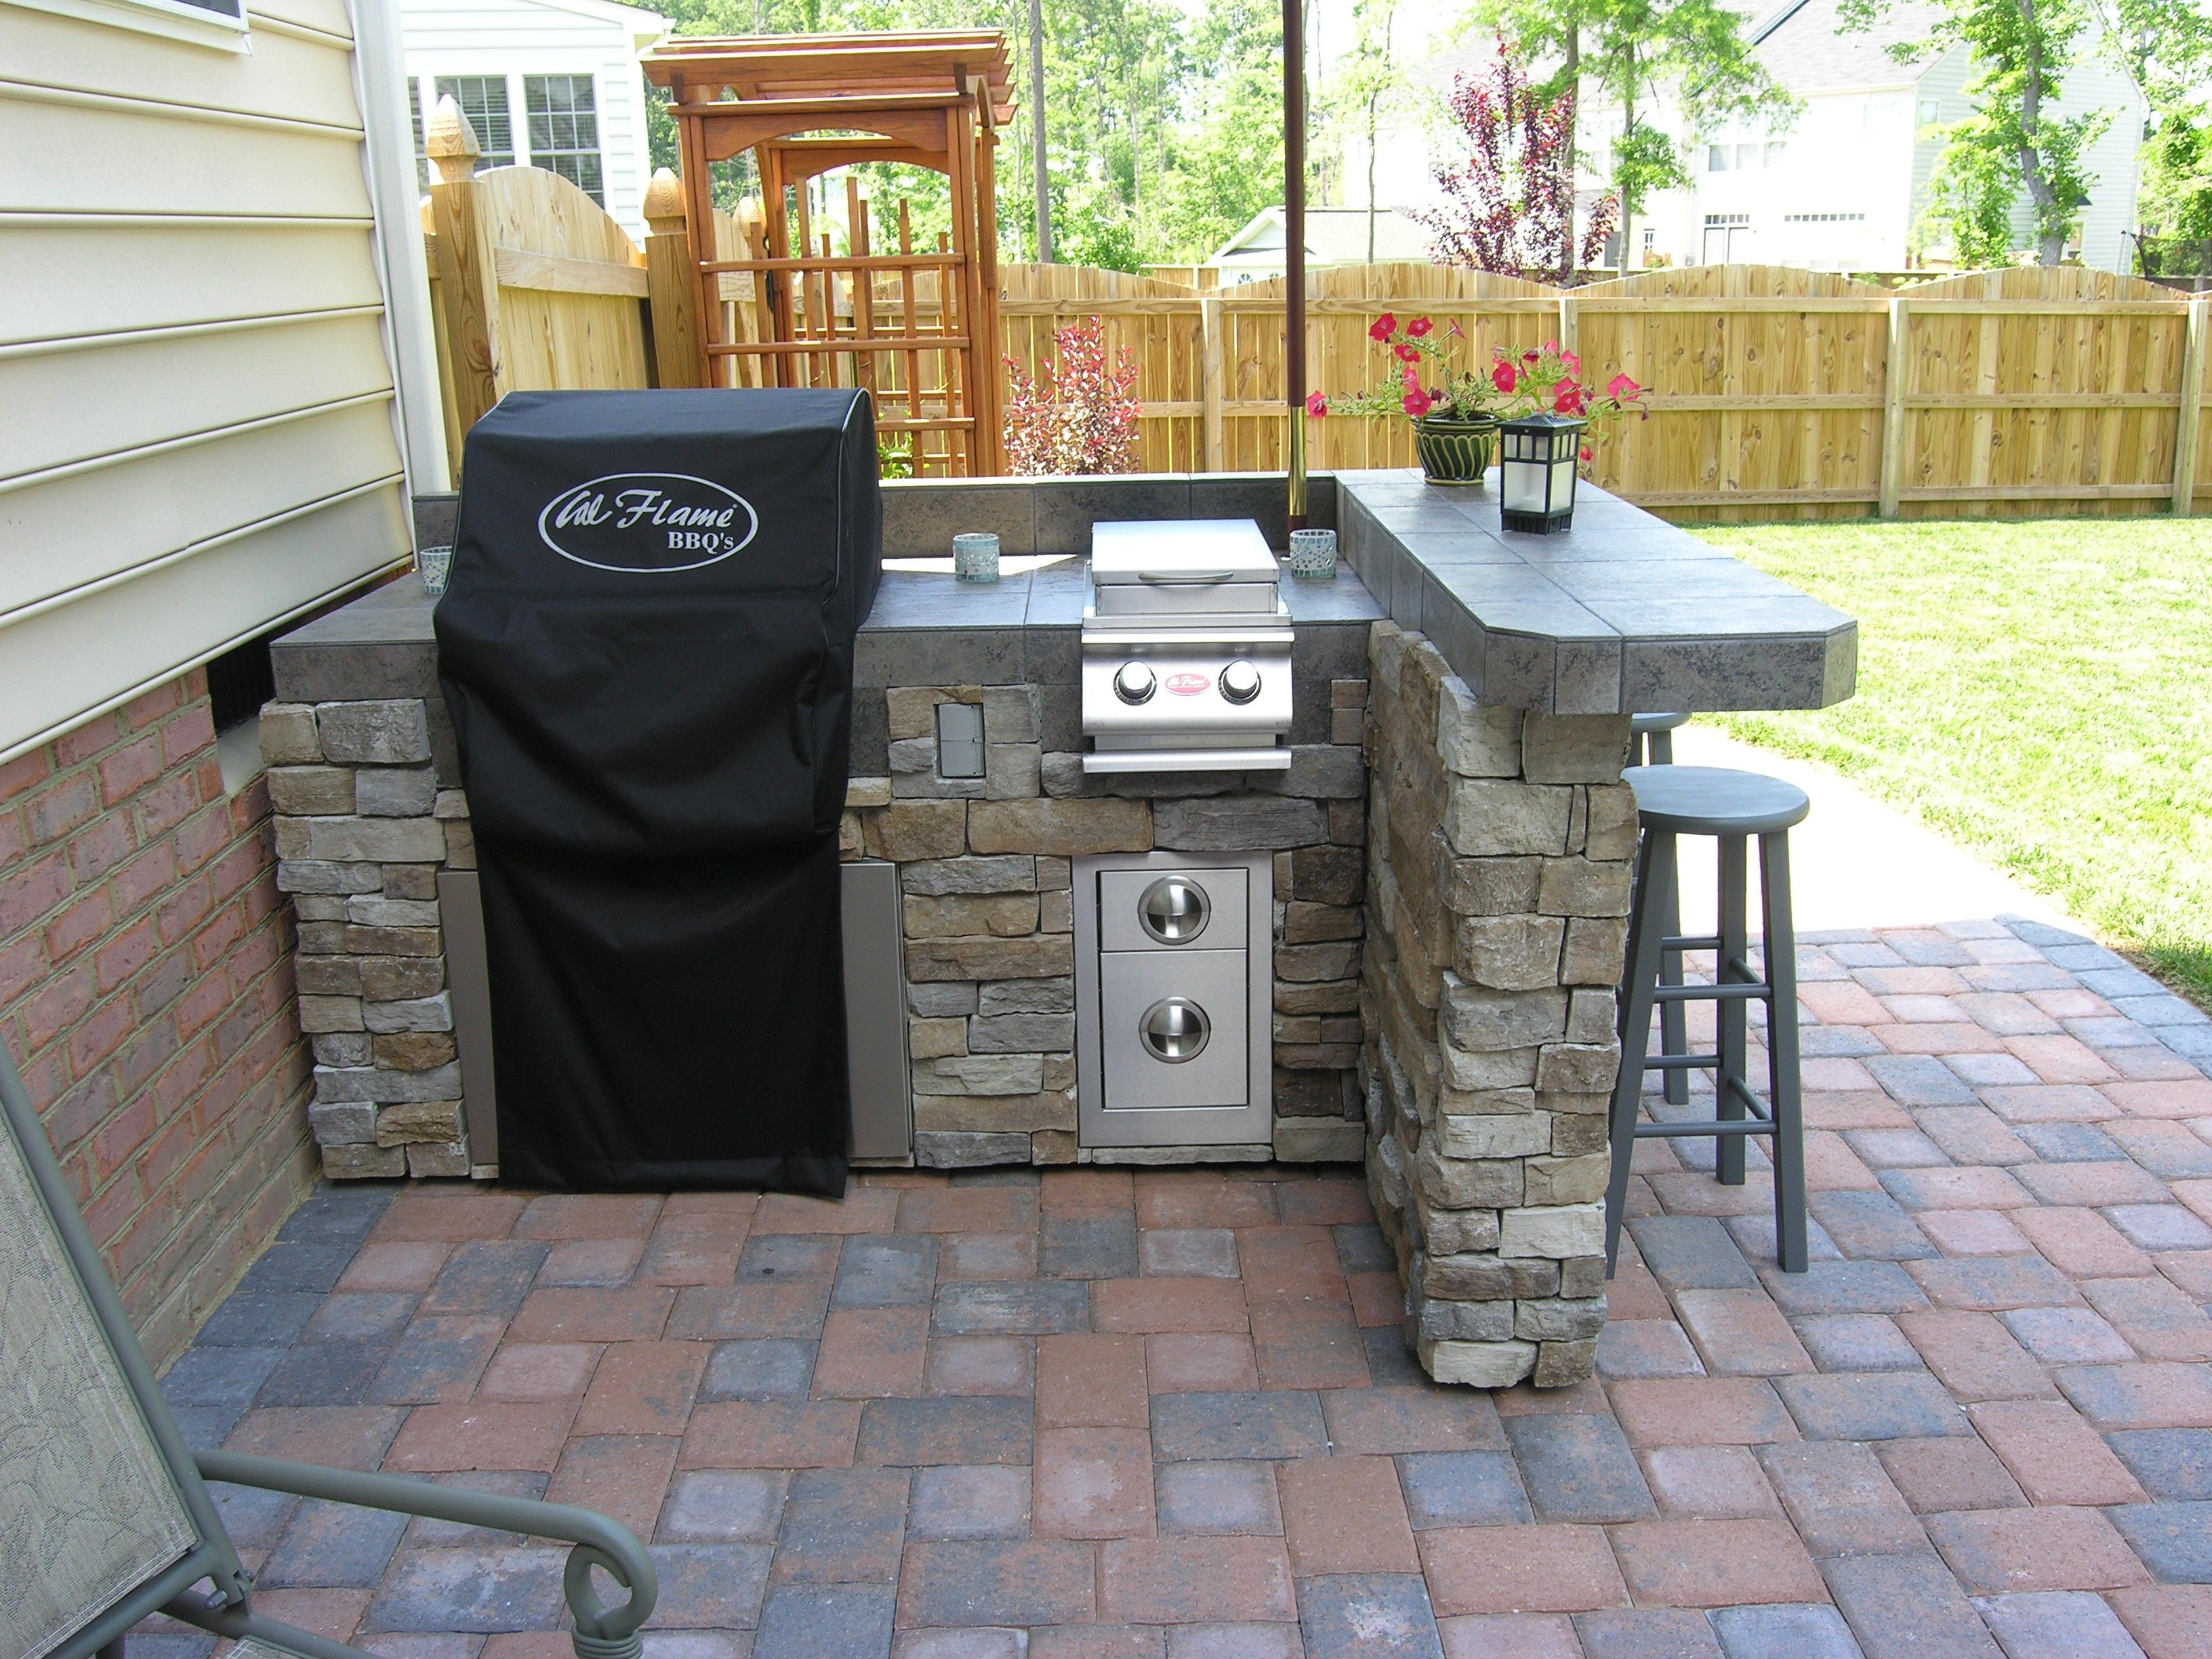 Exterior Ideas Appealing Simple Outdoor Kitchen For Backyard Design Ideas Kitchens Build Y Small Outdoor Kitchens Outdoor Kitchen Decor Outdoor Kitchen Plans